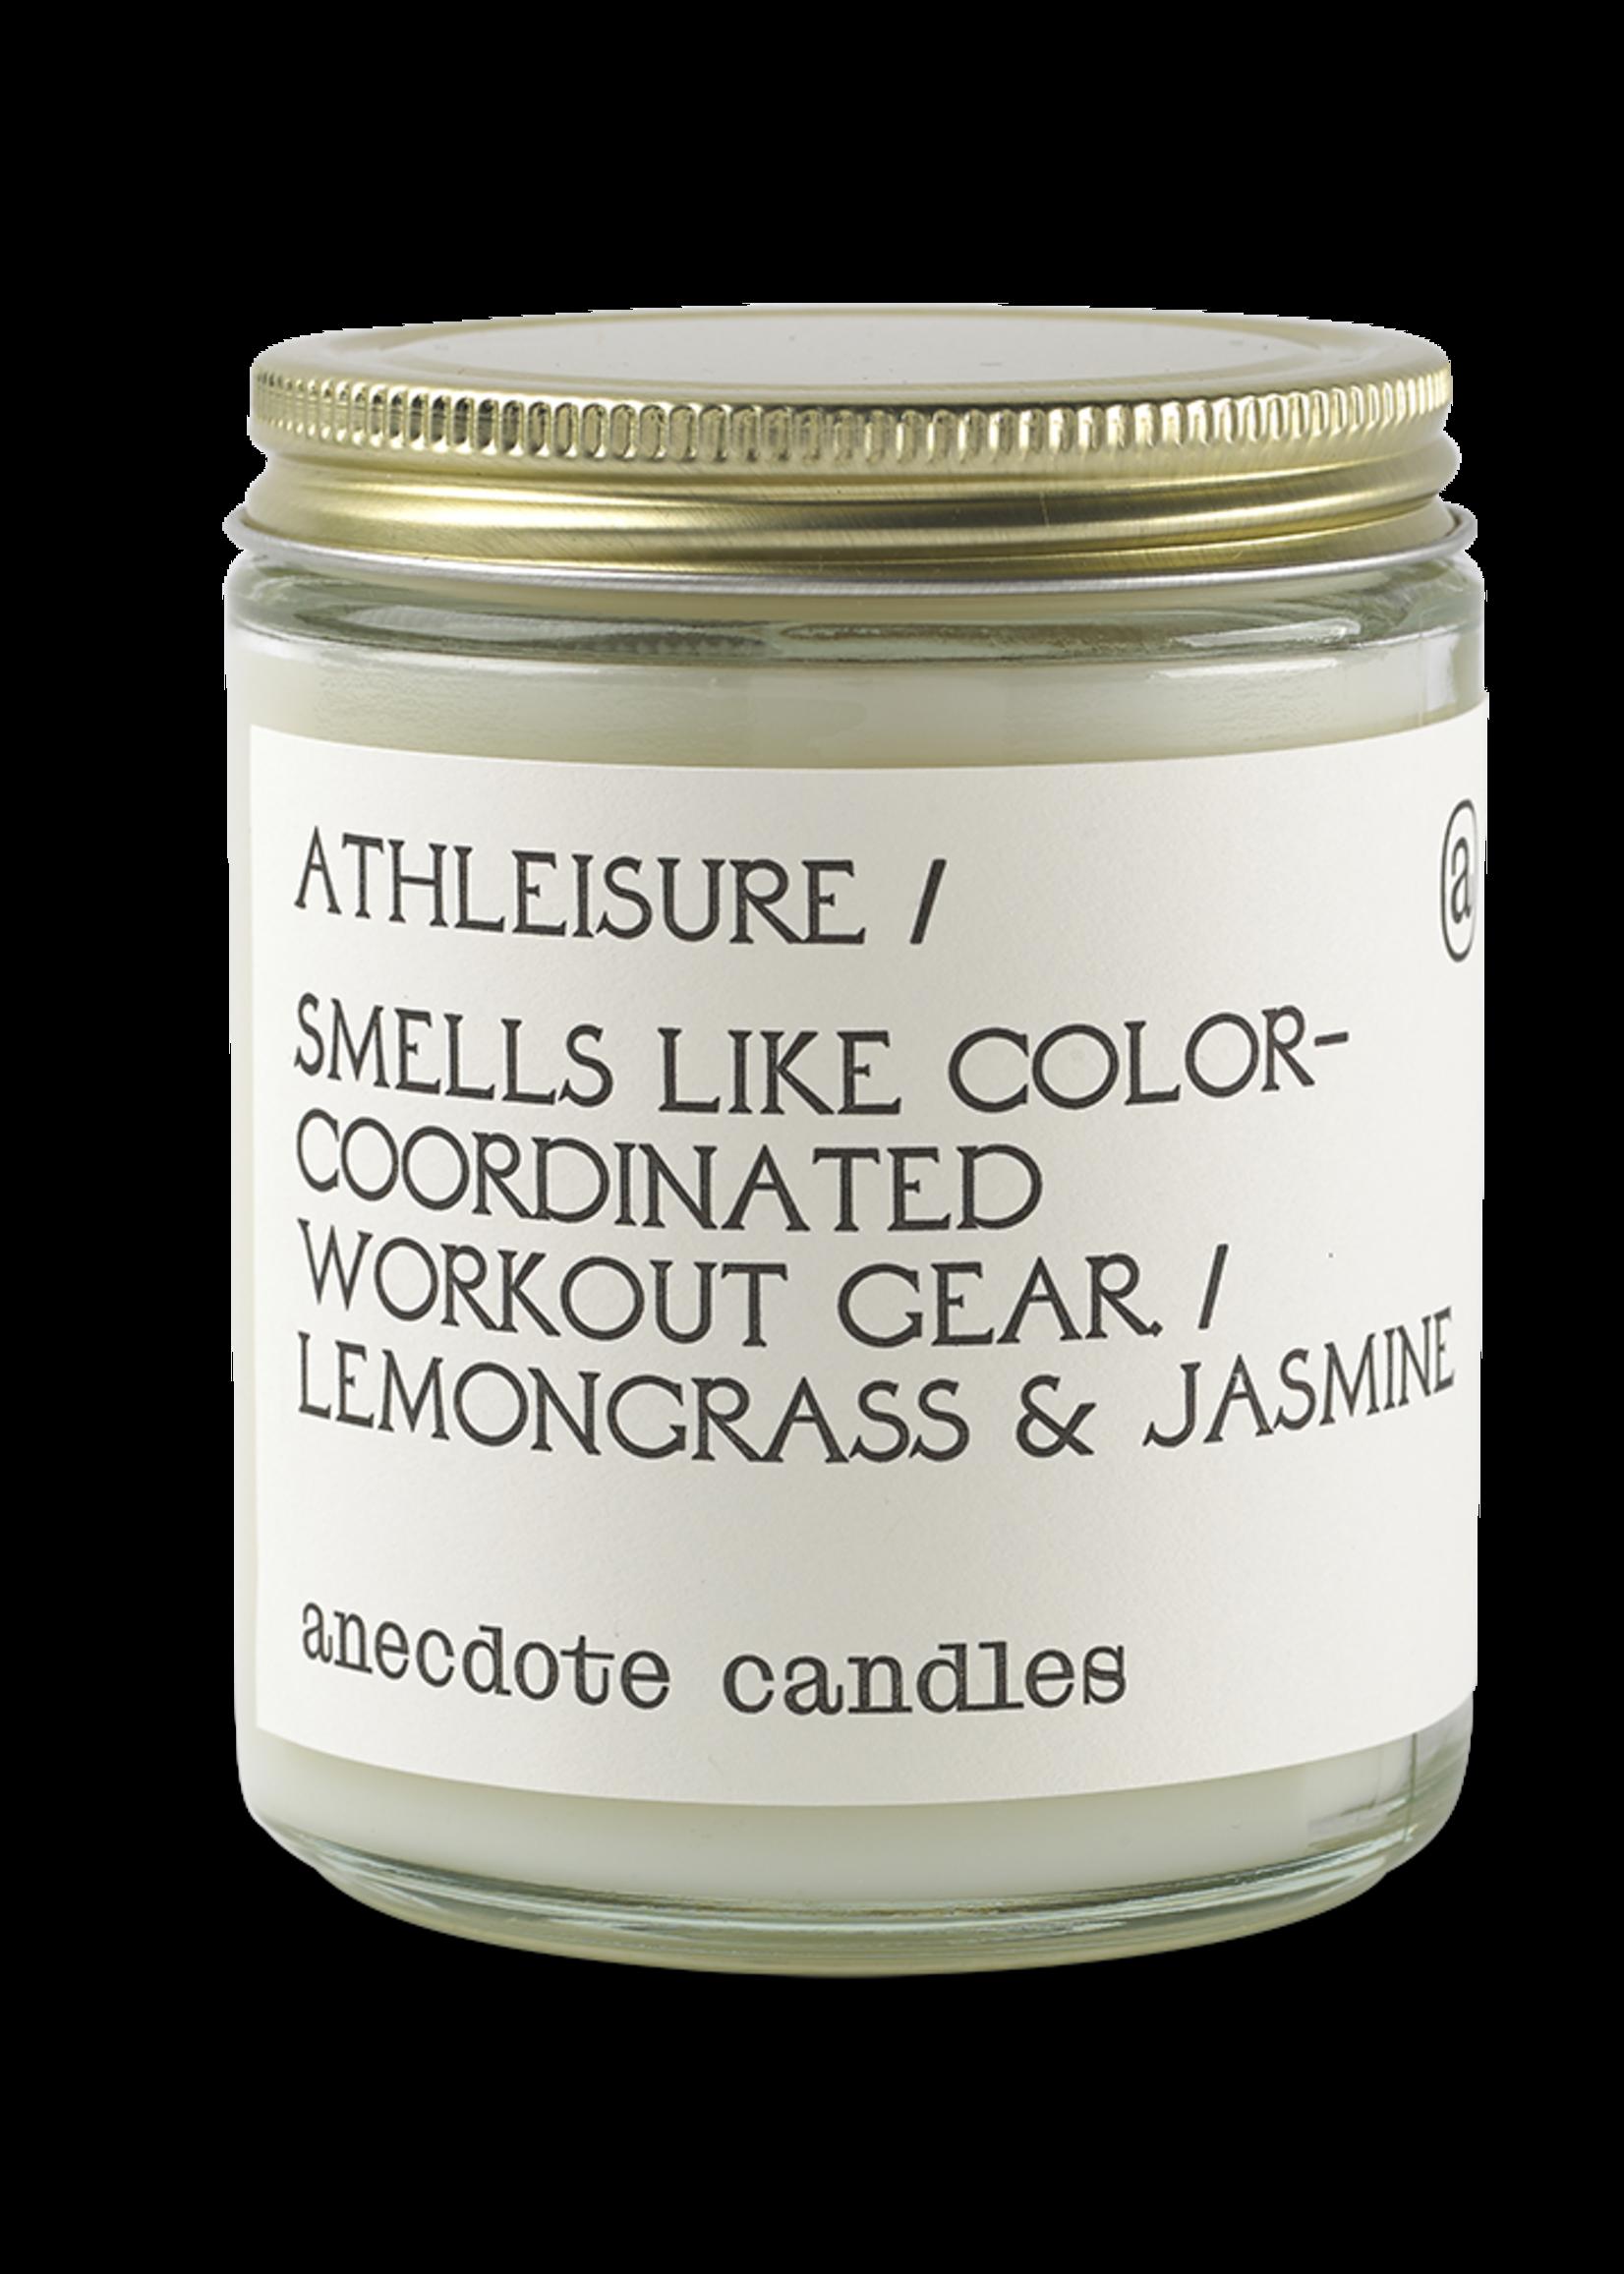 Anecdote Candles Athleisure (Lemongrass & Jasmine) Glass Jar Candle